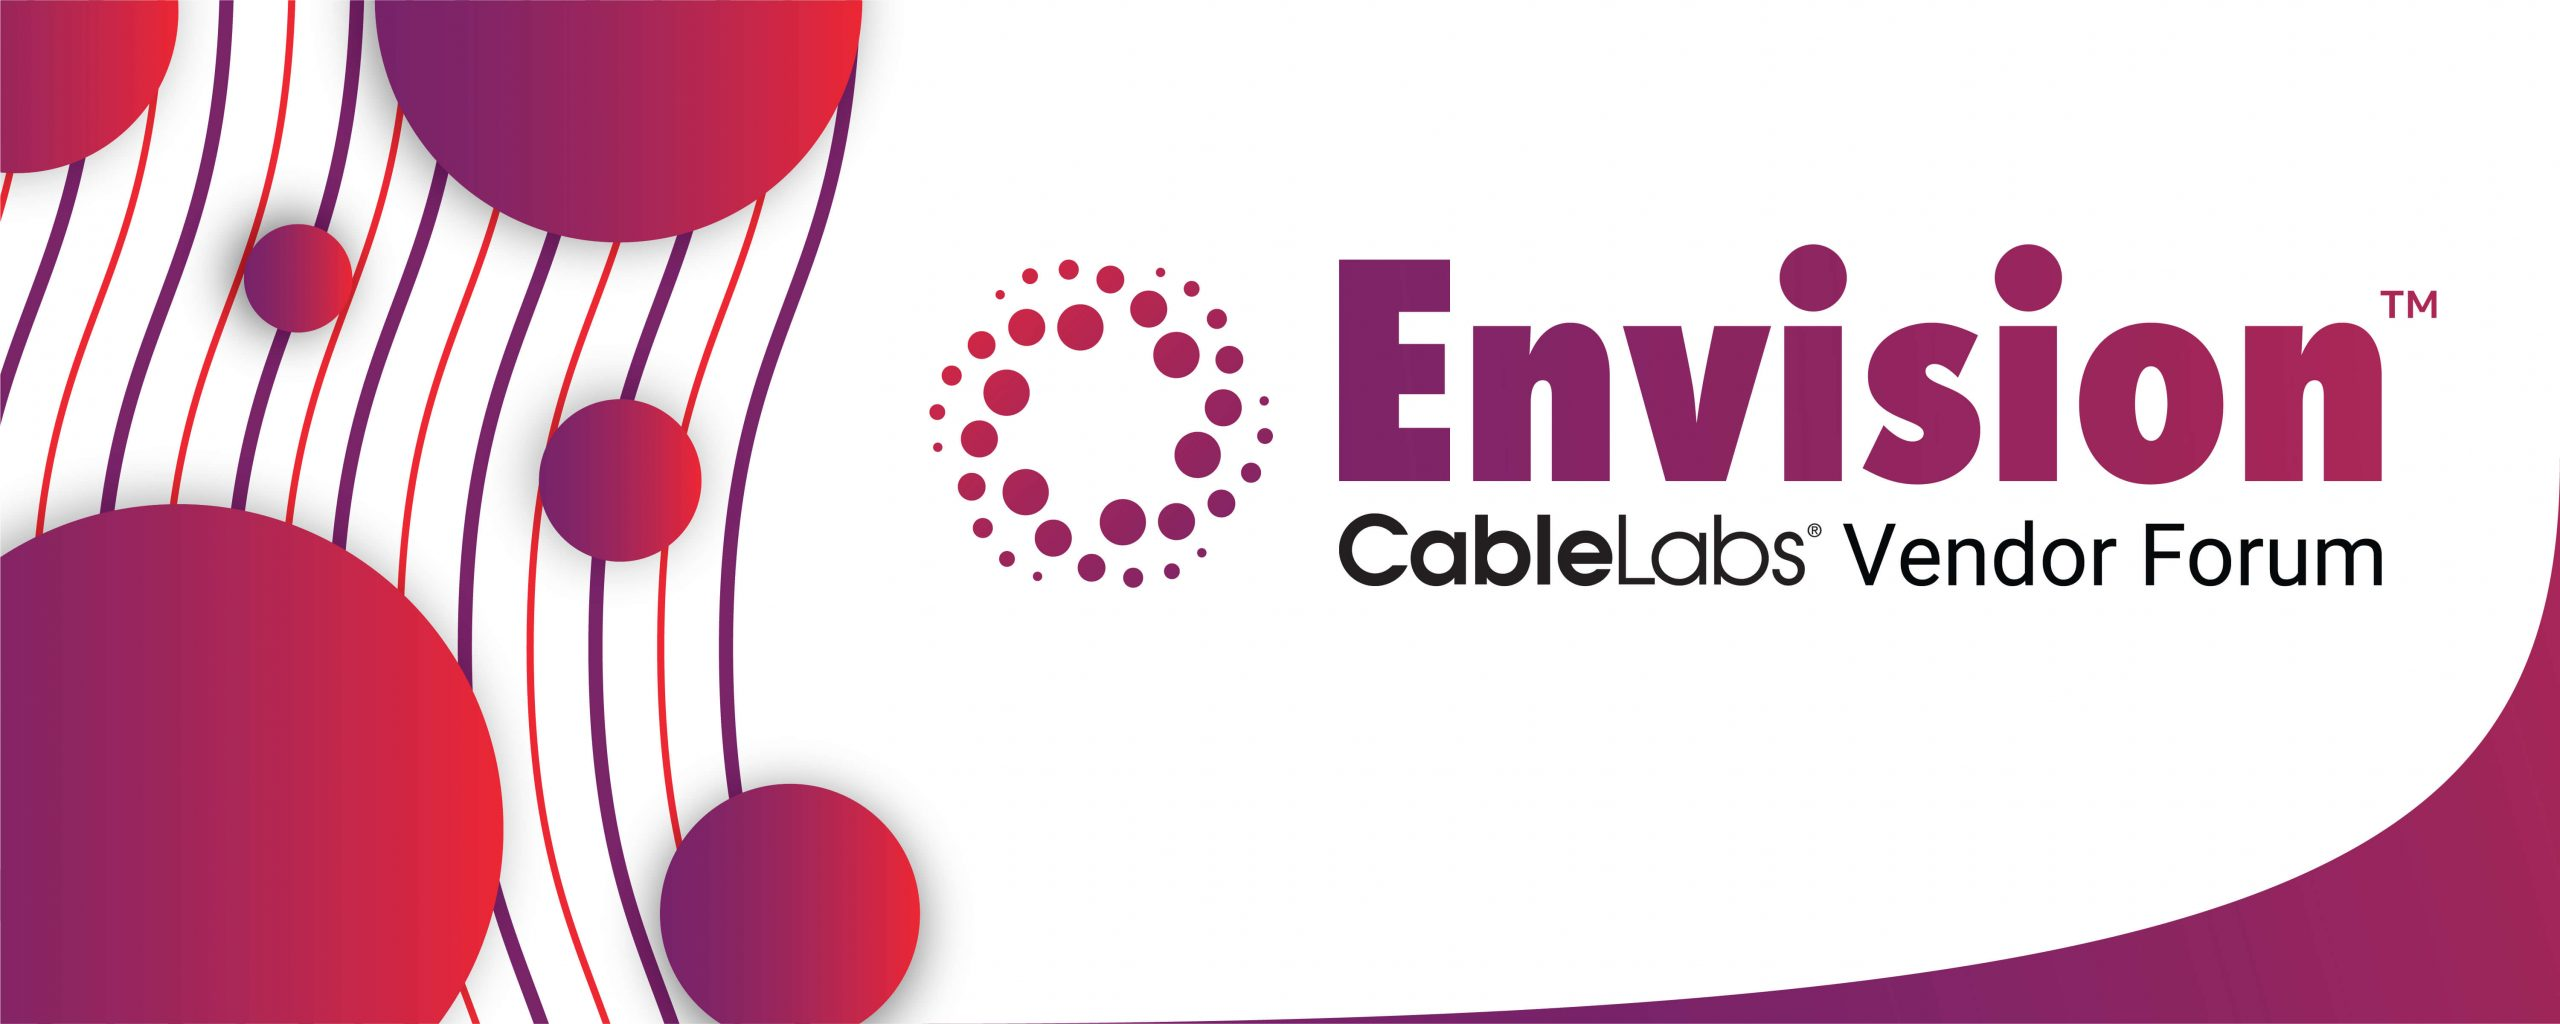 CableLabs Envision Vendor Forum 2019